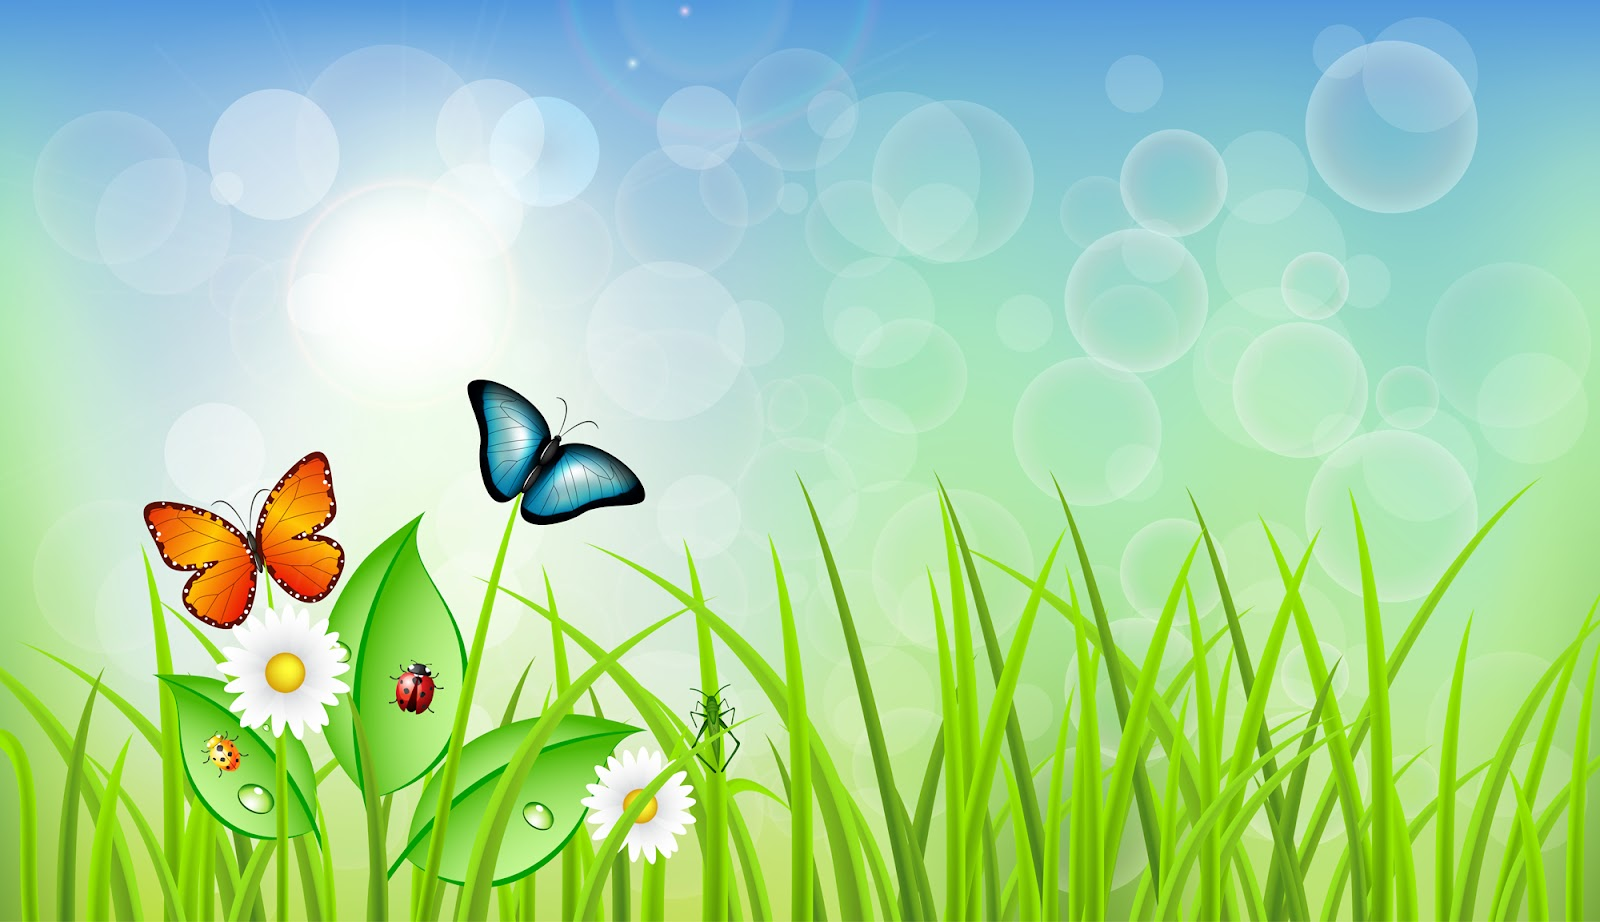 16 Spring Cartoon Landscape Vector Images